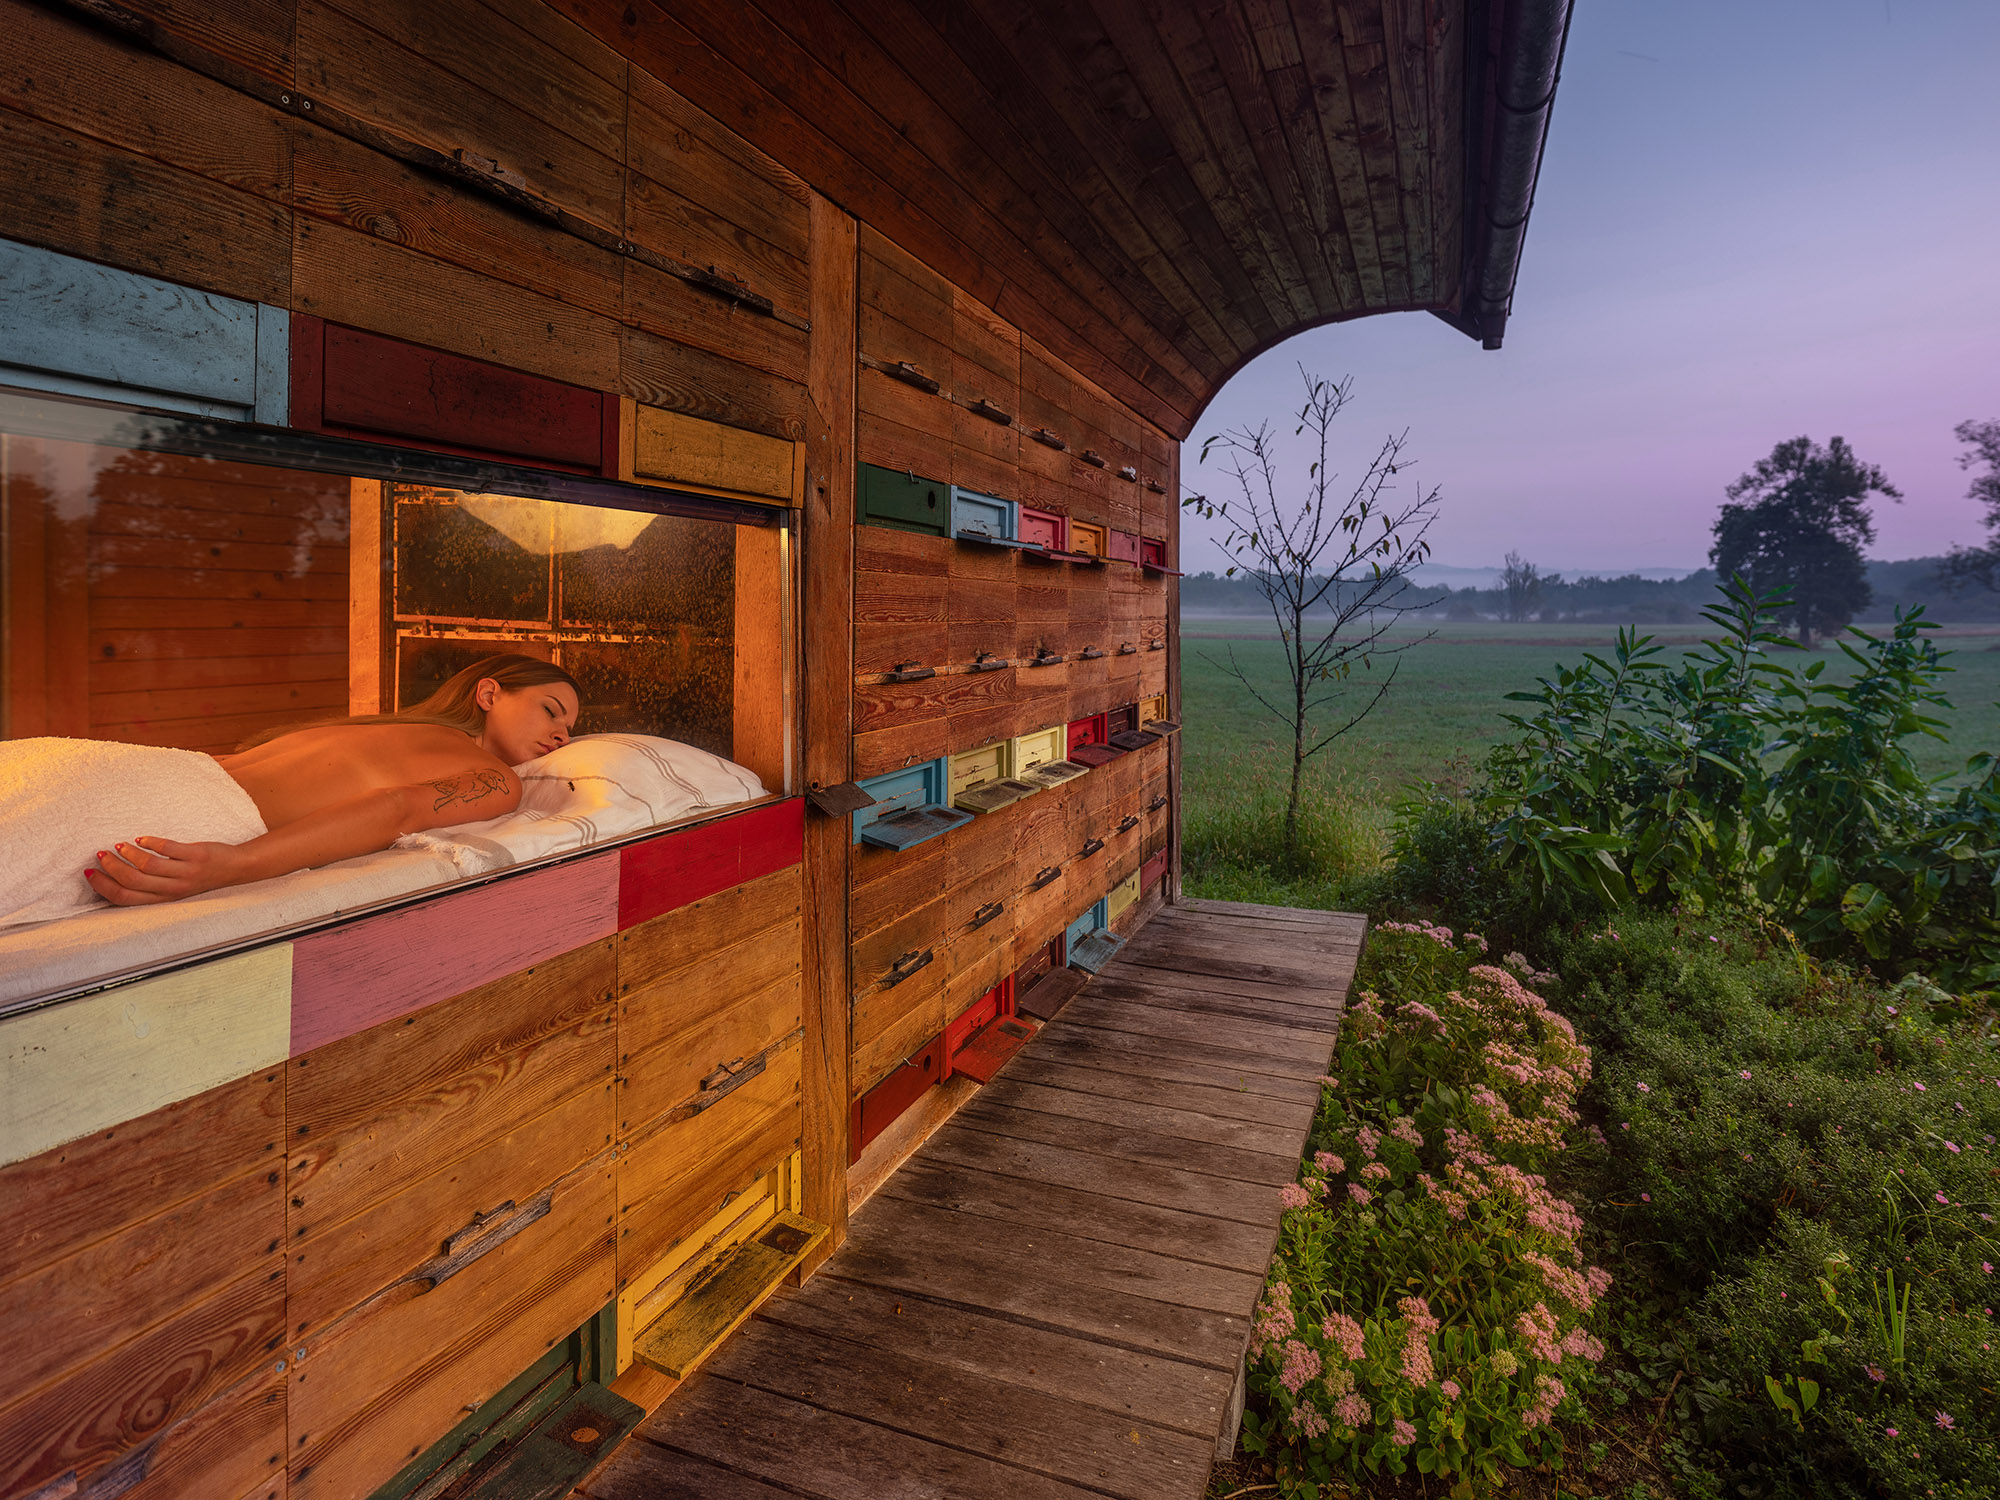 A honey experience on the edge of the Krakovski primeval forest